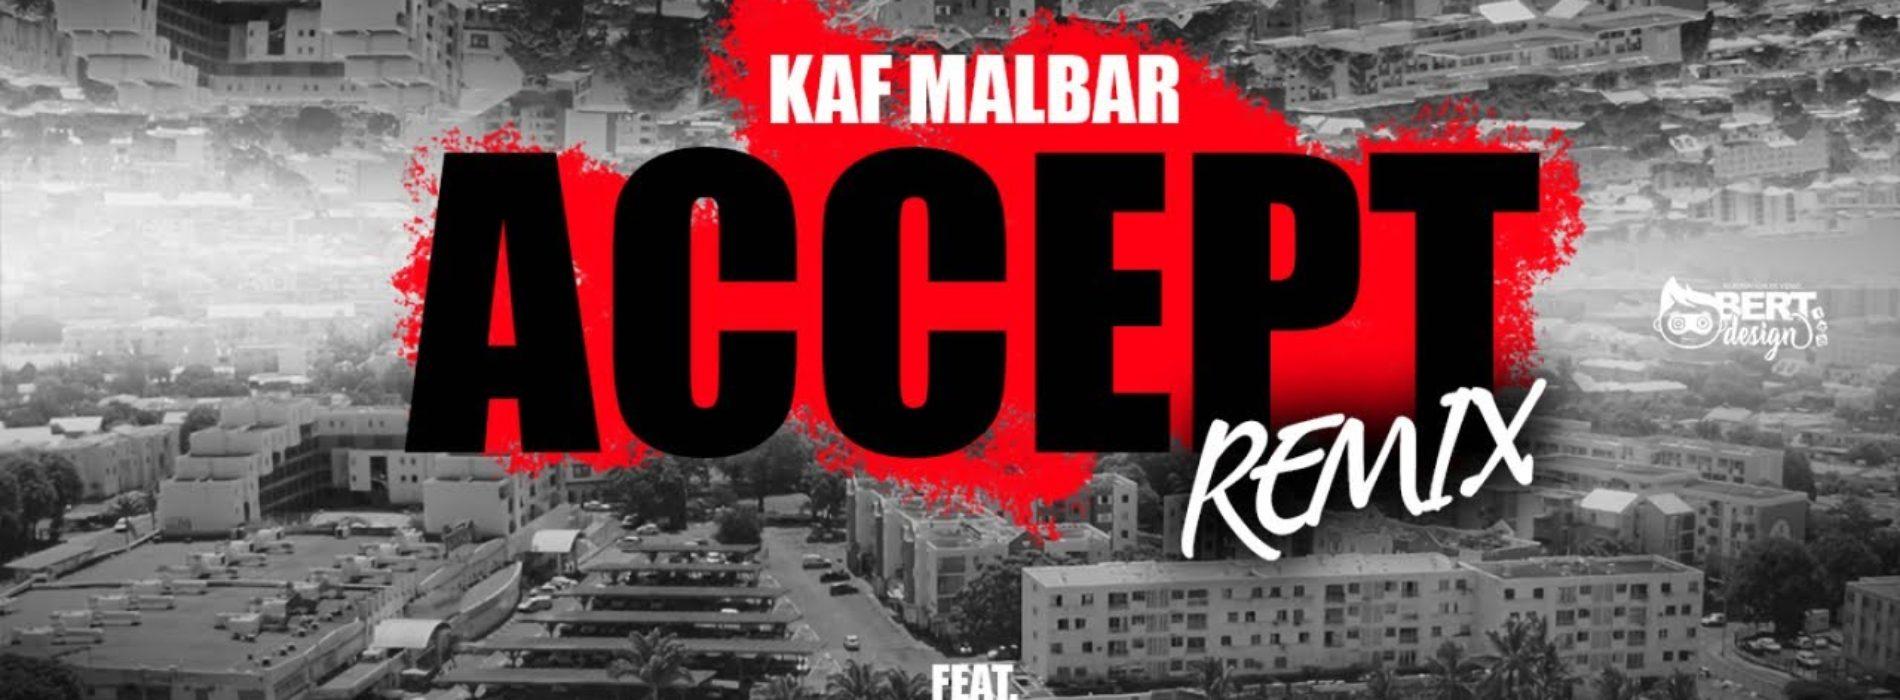 Kaf Malbar Ft. Deric, Boss&Youth, Nicko – Accept (Remix) – #AnFouPaMalStaya – Avril 2019